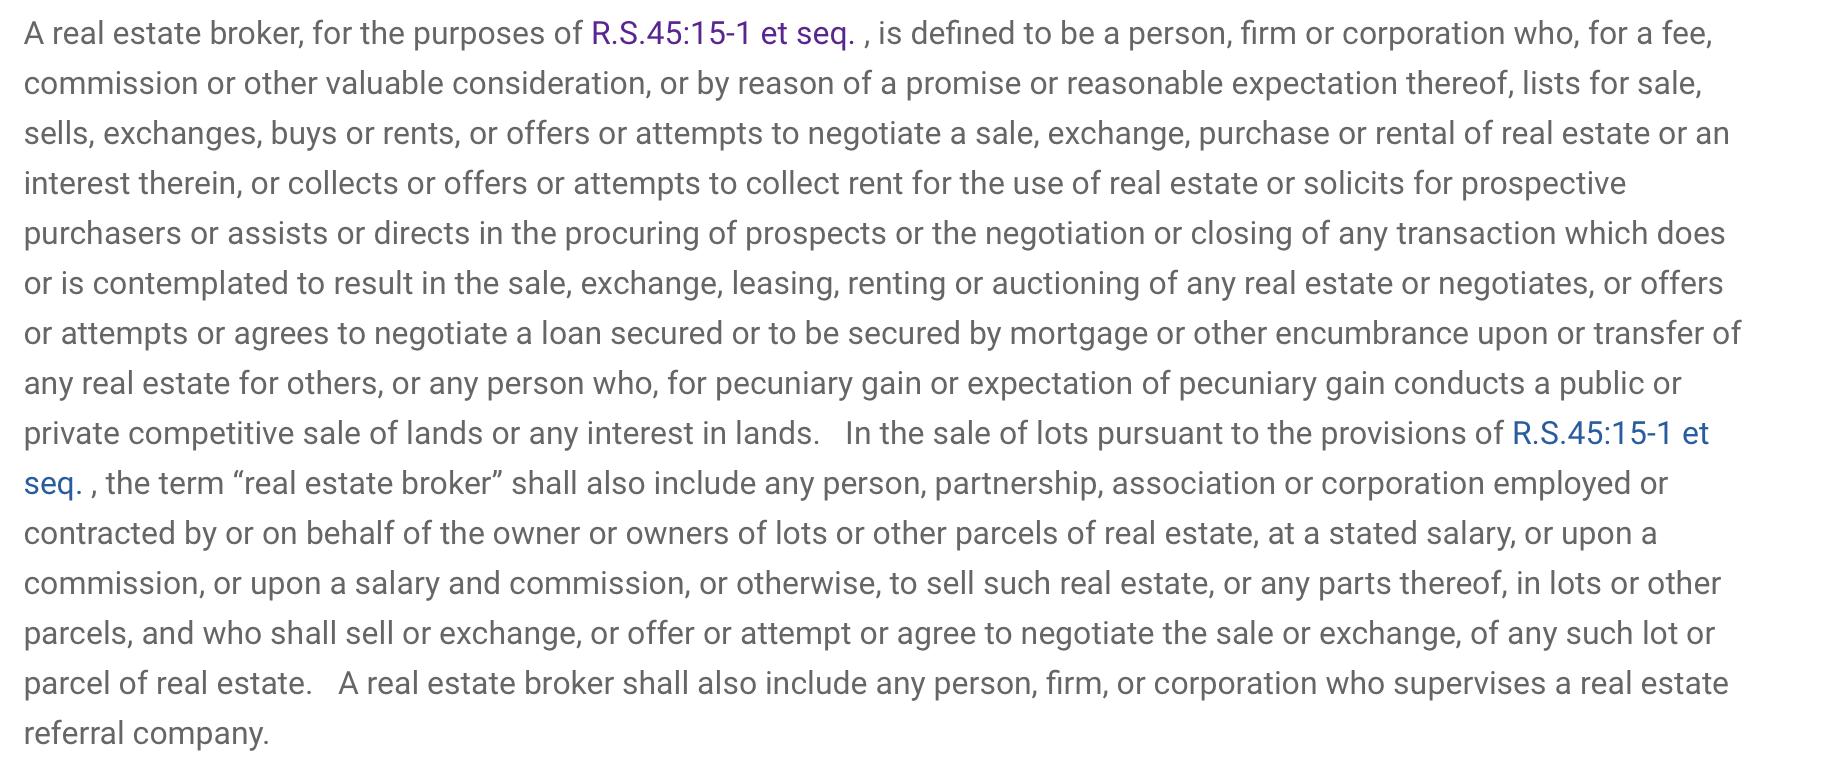 New Jersey real estate broker